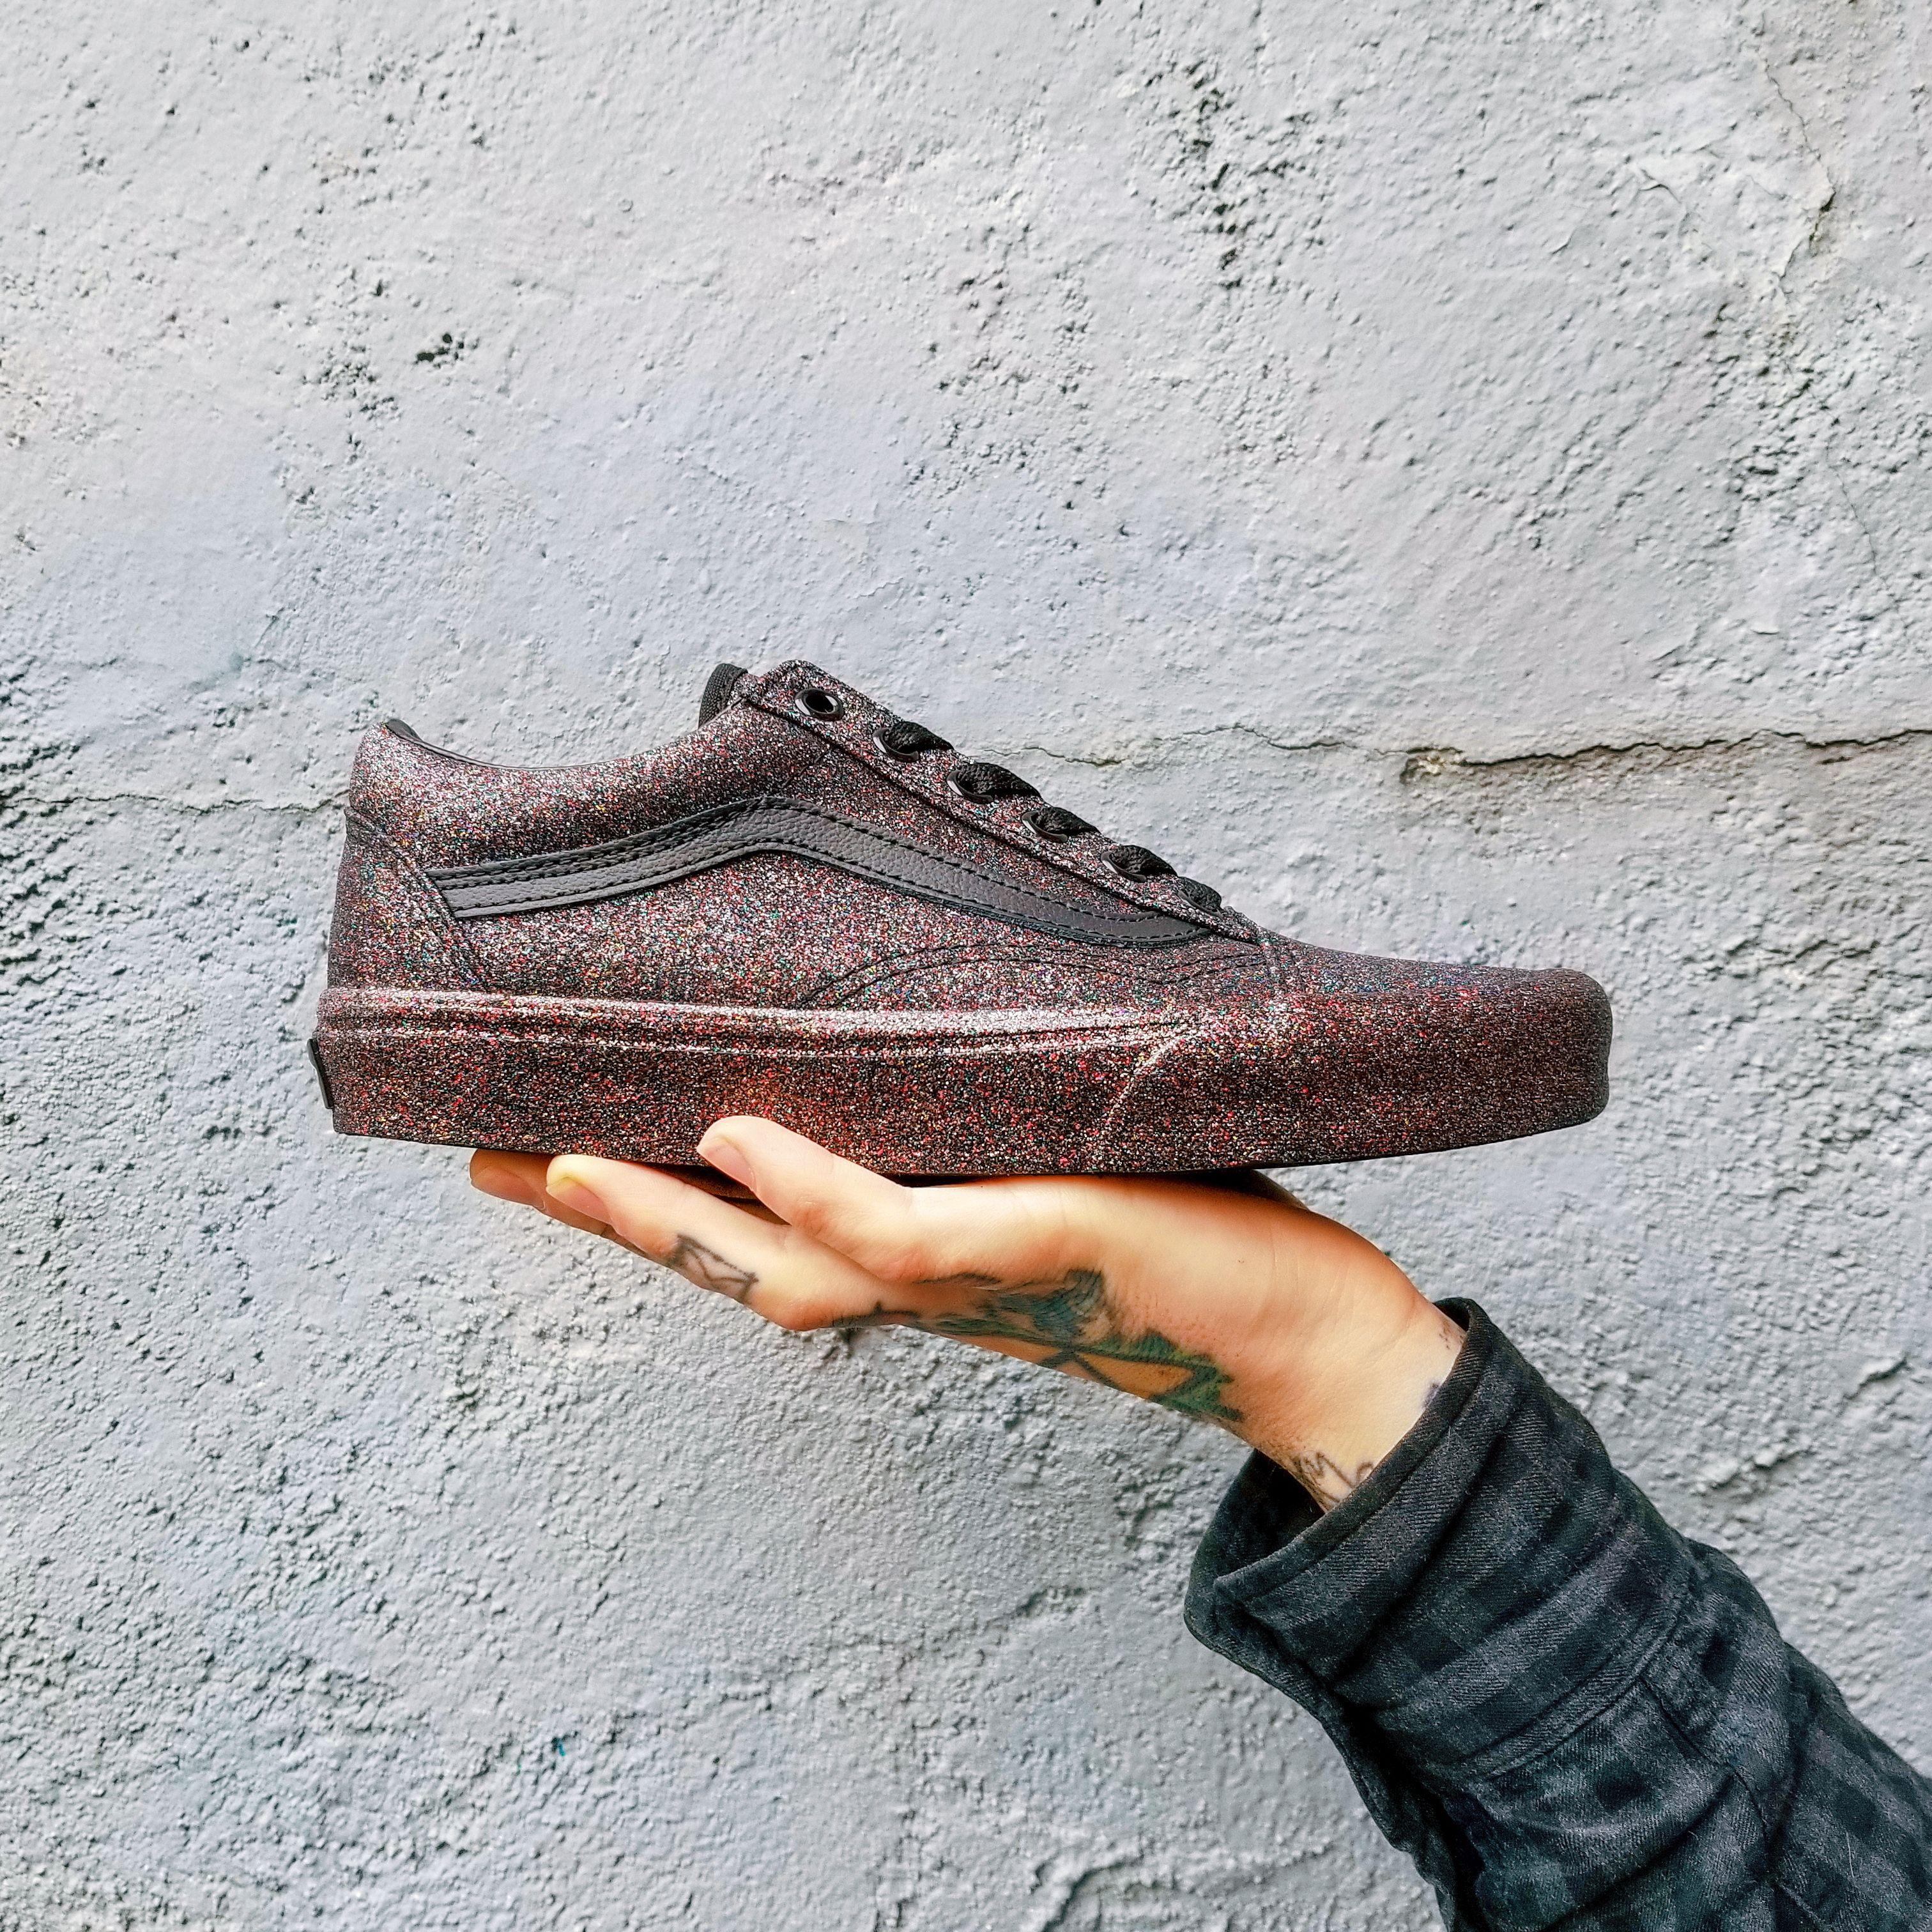 5a9d9facb6ca0 Vans Old Skool (Rainbow Glitter) Black/Black in 2019 | ShoePorn ...